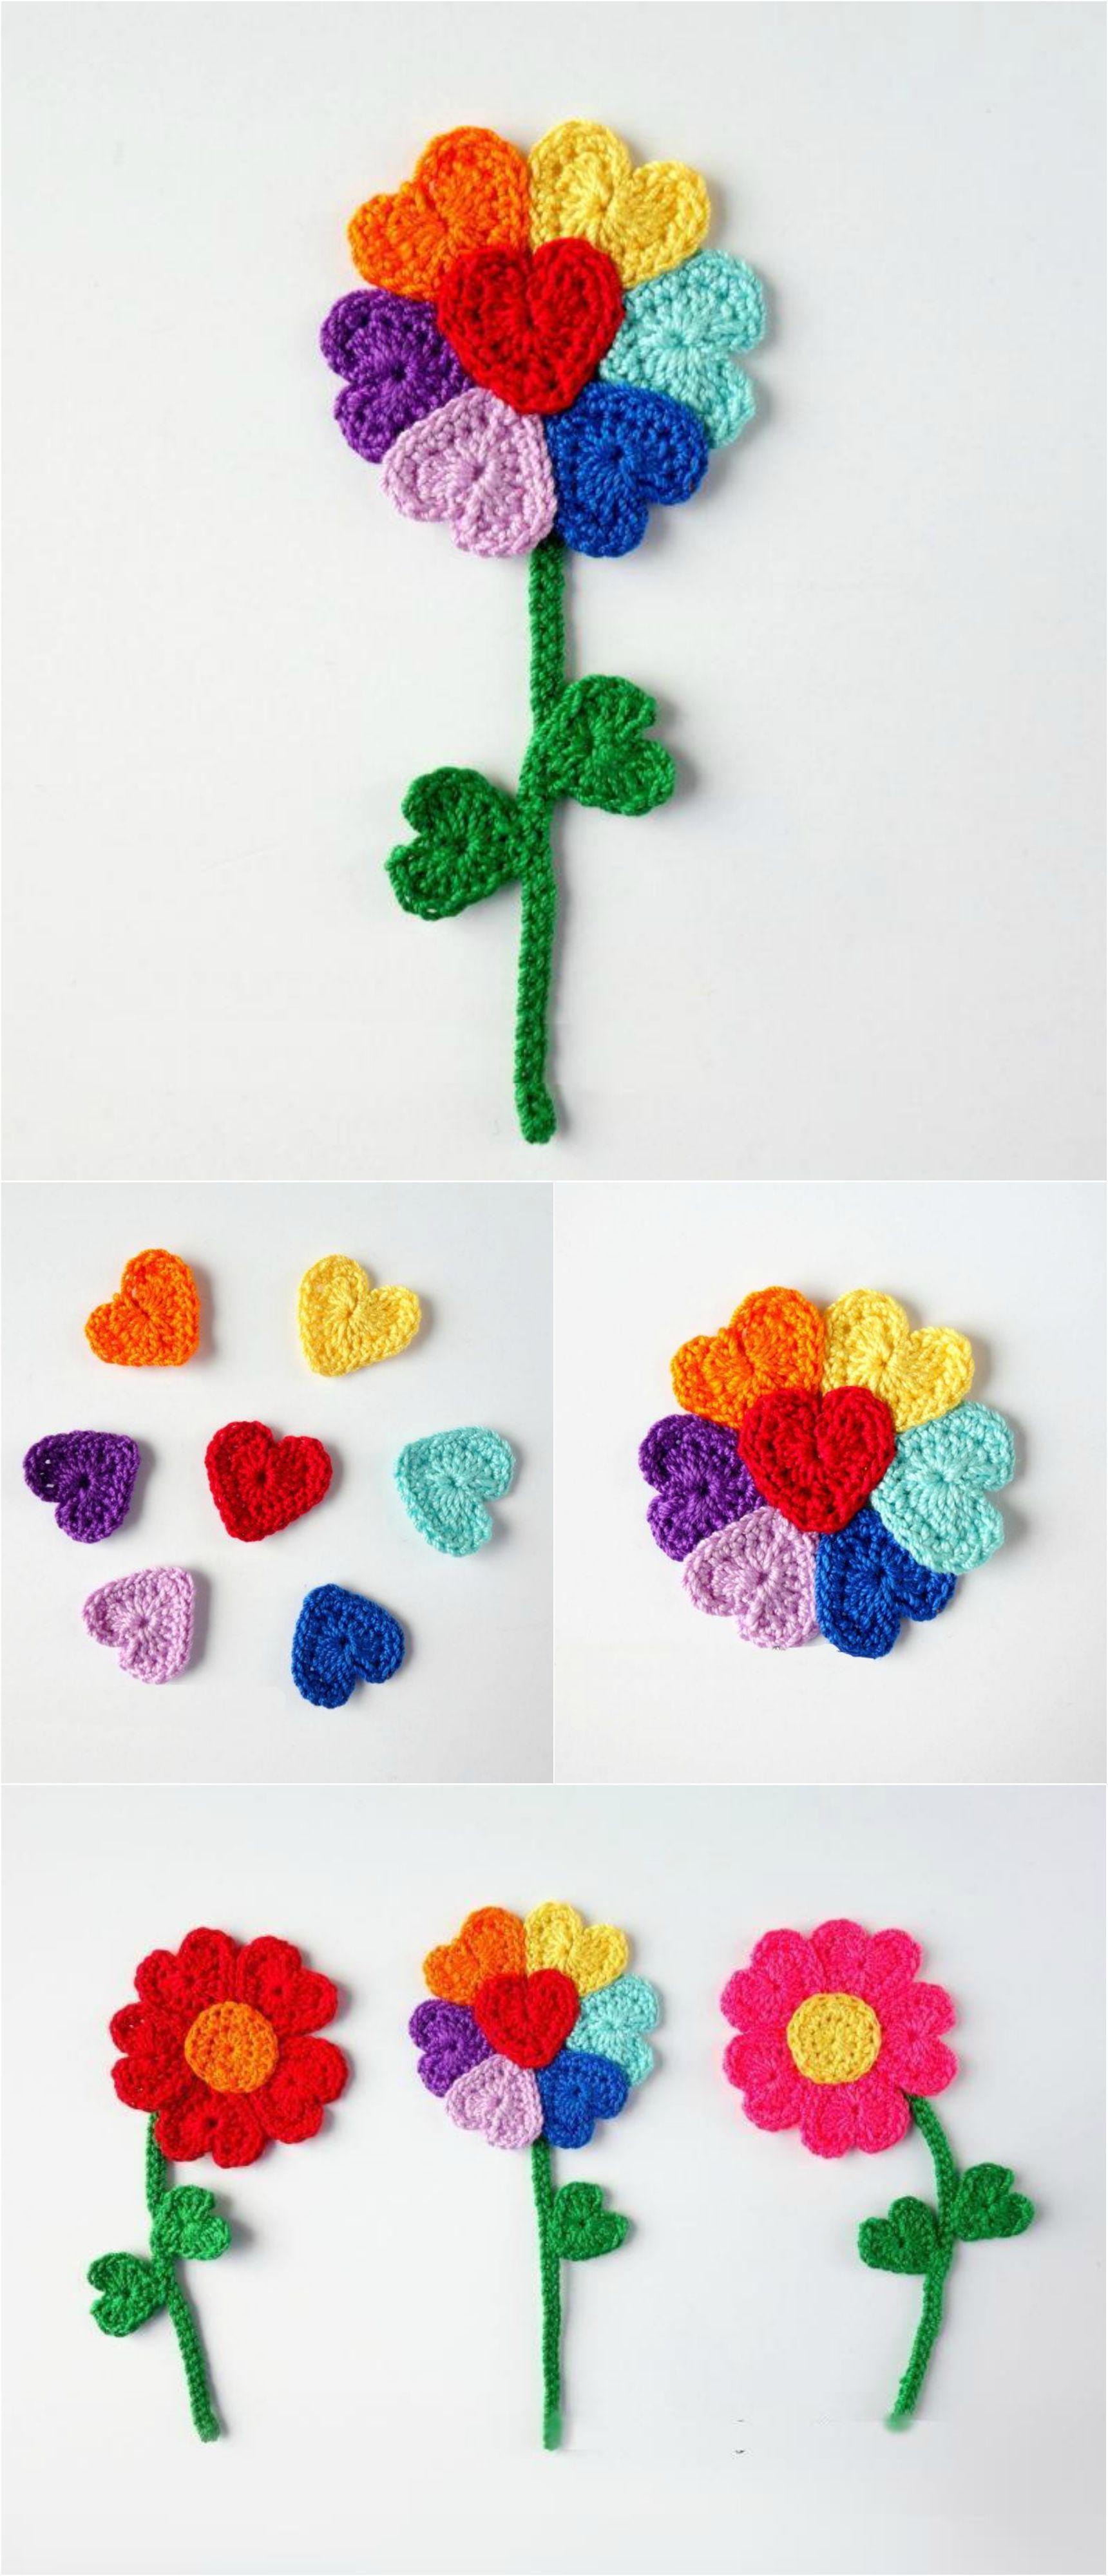 Crochet Flower With Hearts | flores | Pinterest | Ganchillo, Flores ...